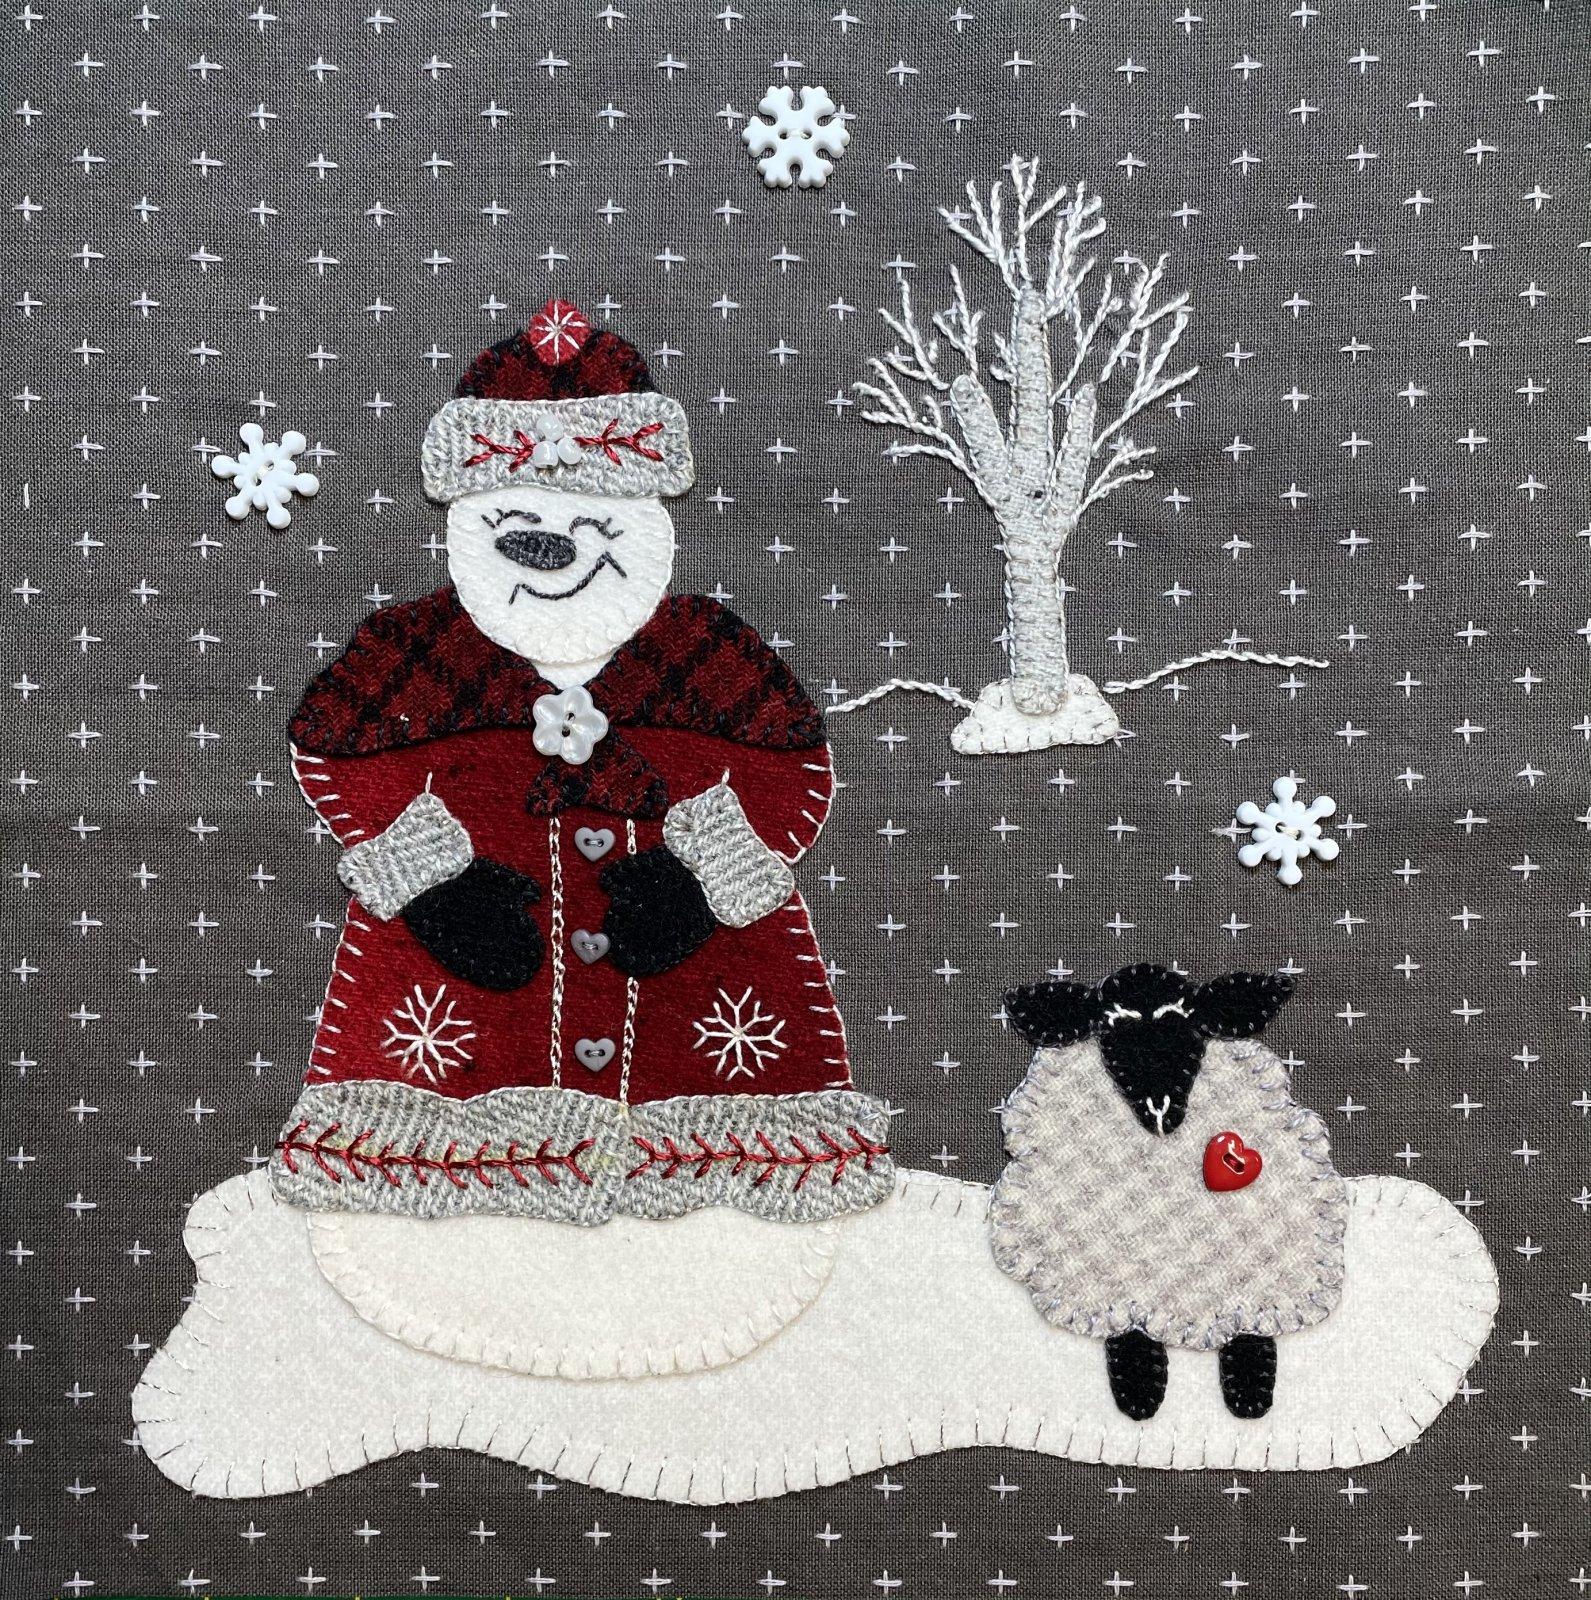 Snow Much Joy Block 3 Digital Download Pattern